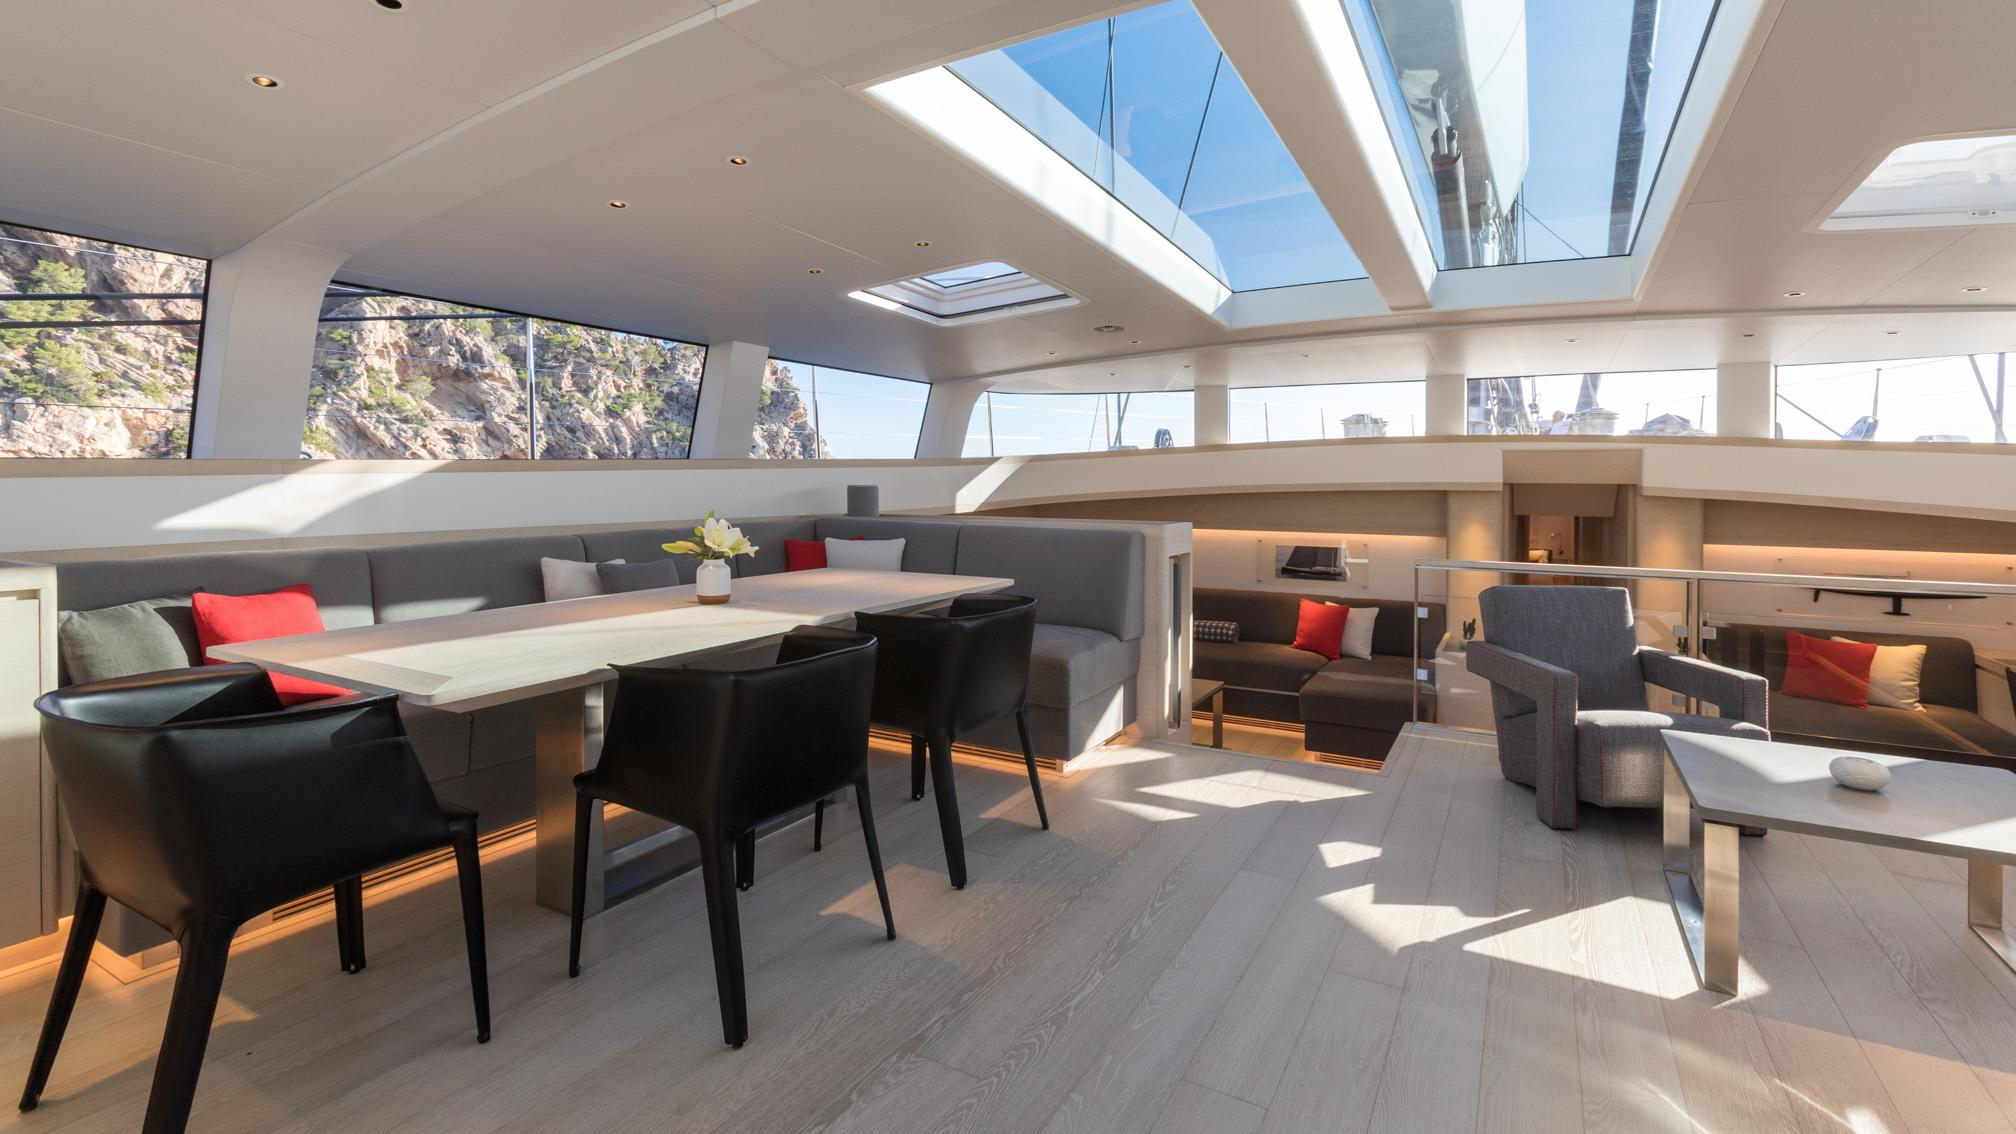 g2 cinderella iv sailing yacht vitters 2009 39m saloon after refit